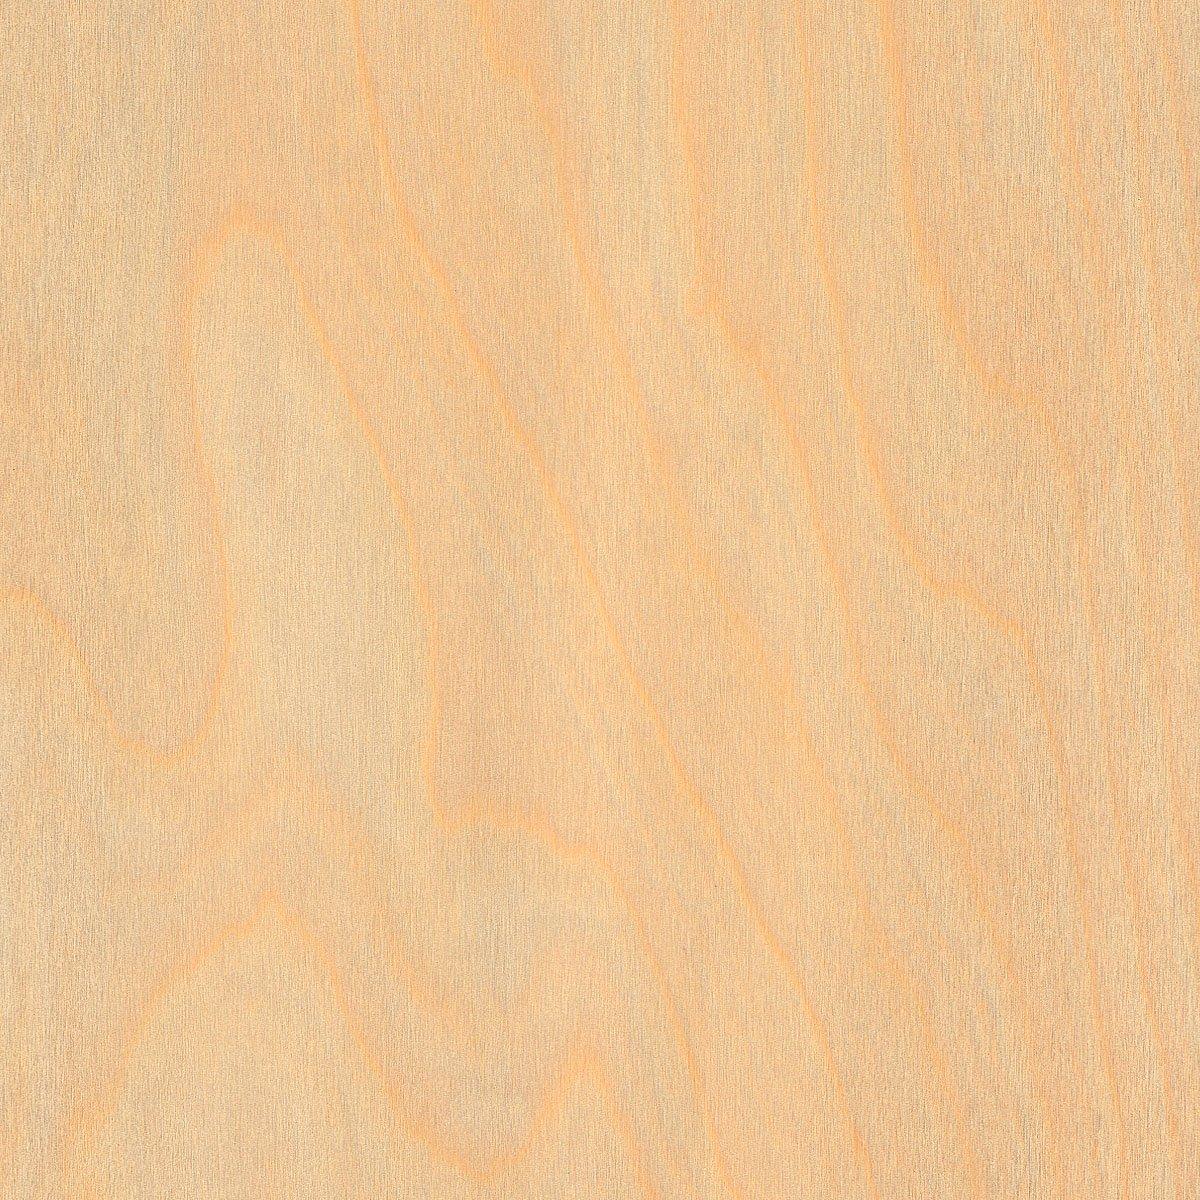 Birch White Wood Veneer Rotary Spliced 2'x8' PSA(Peel and Stick) 9505 Sheet